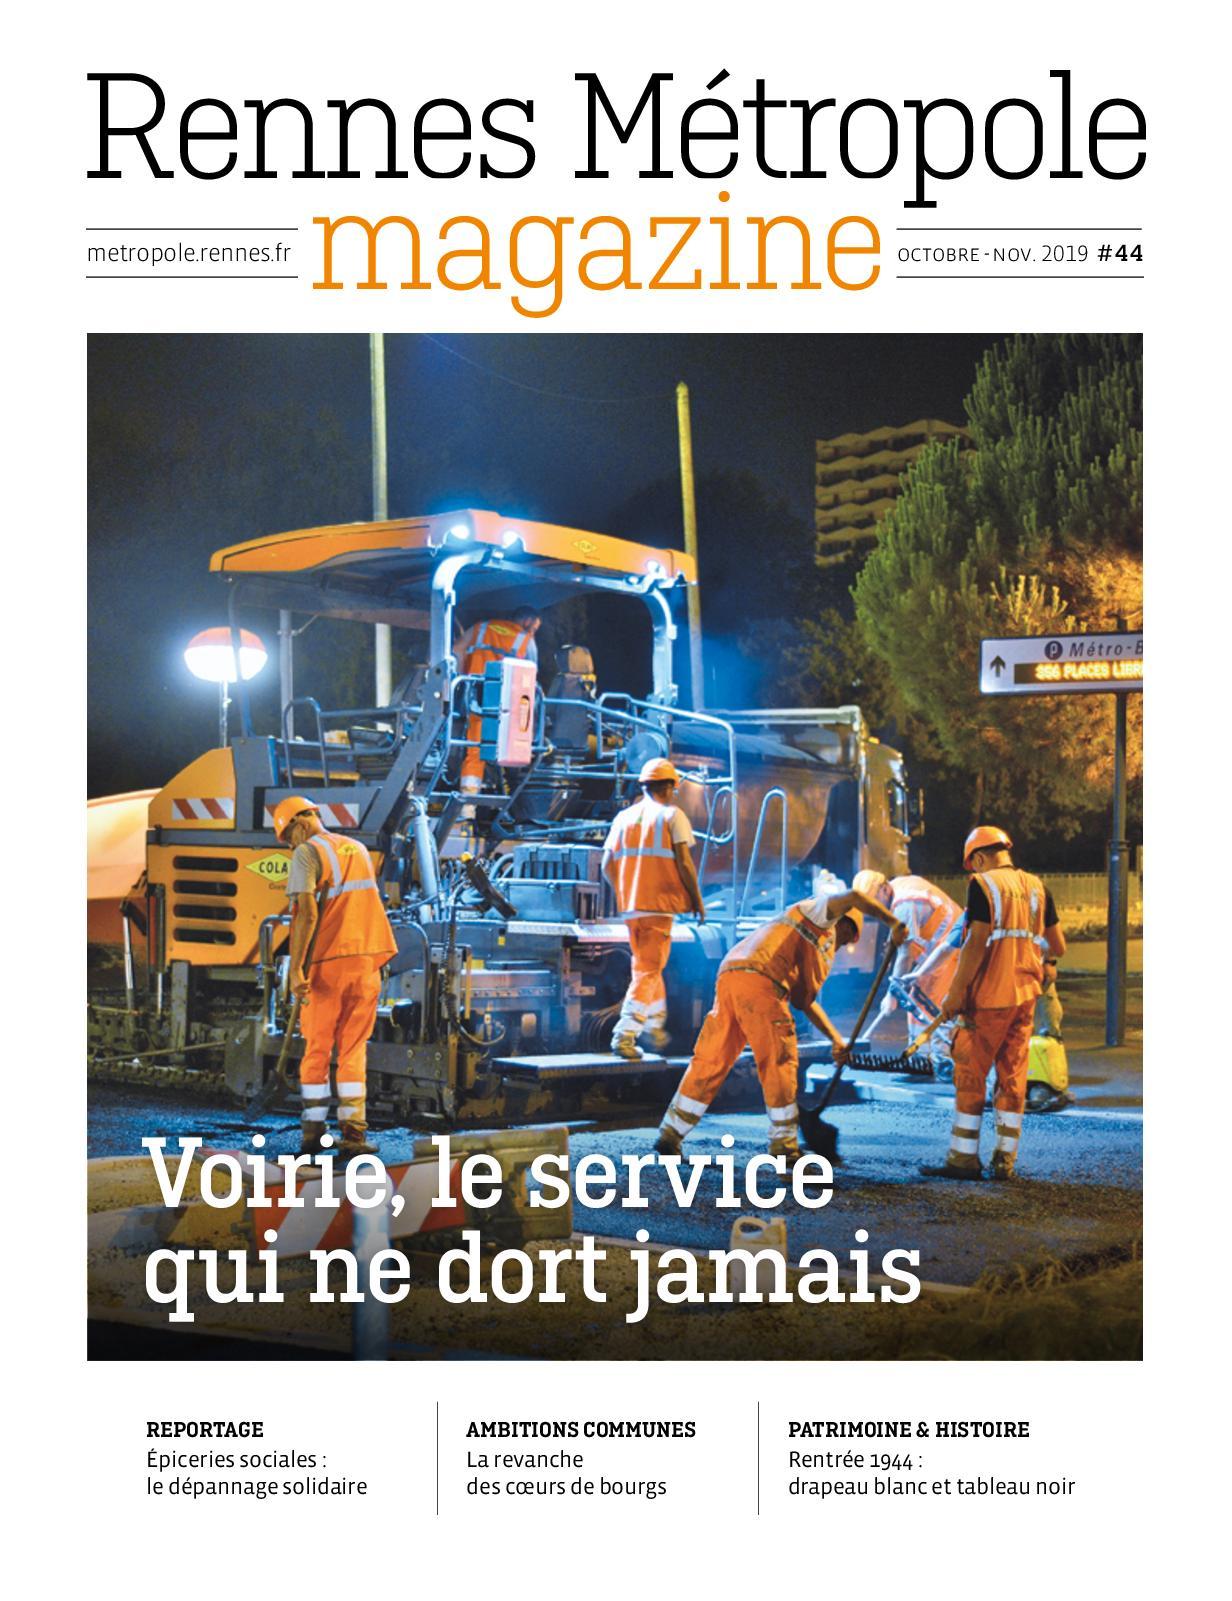 Calaméo Rennes Métropole Magazine Octnov 2019